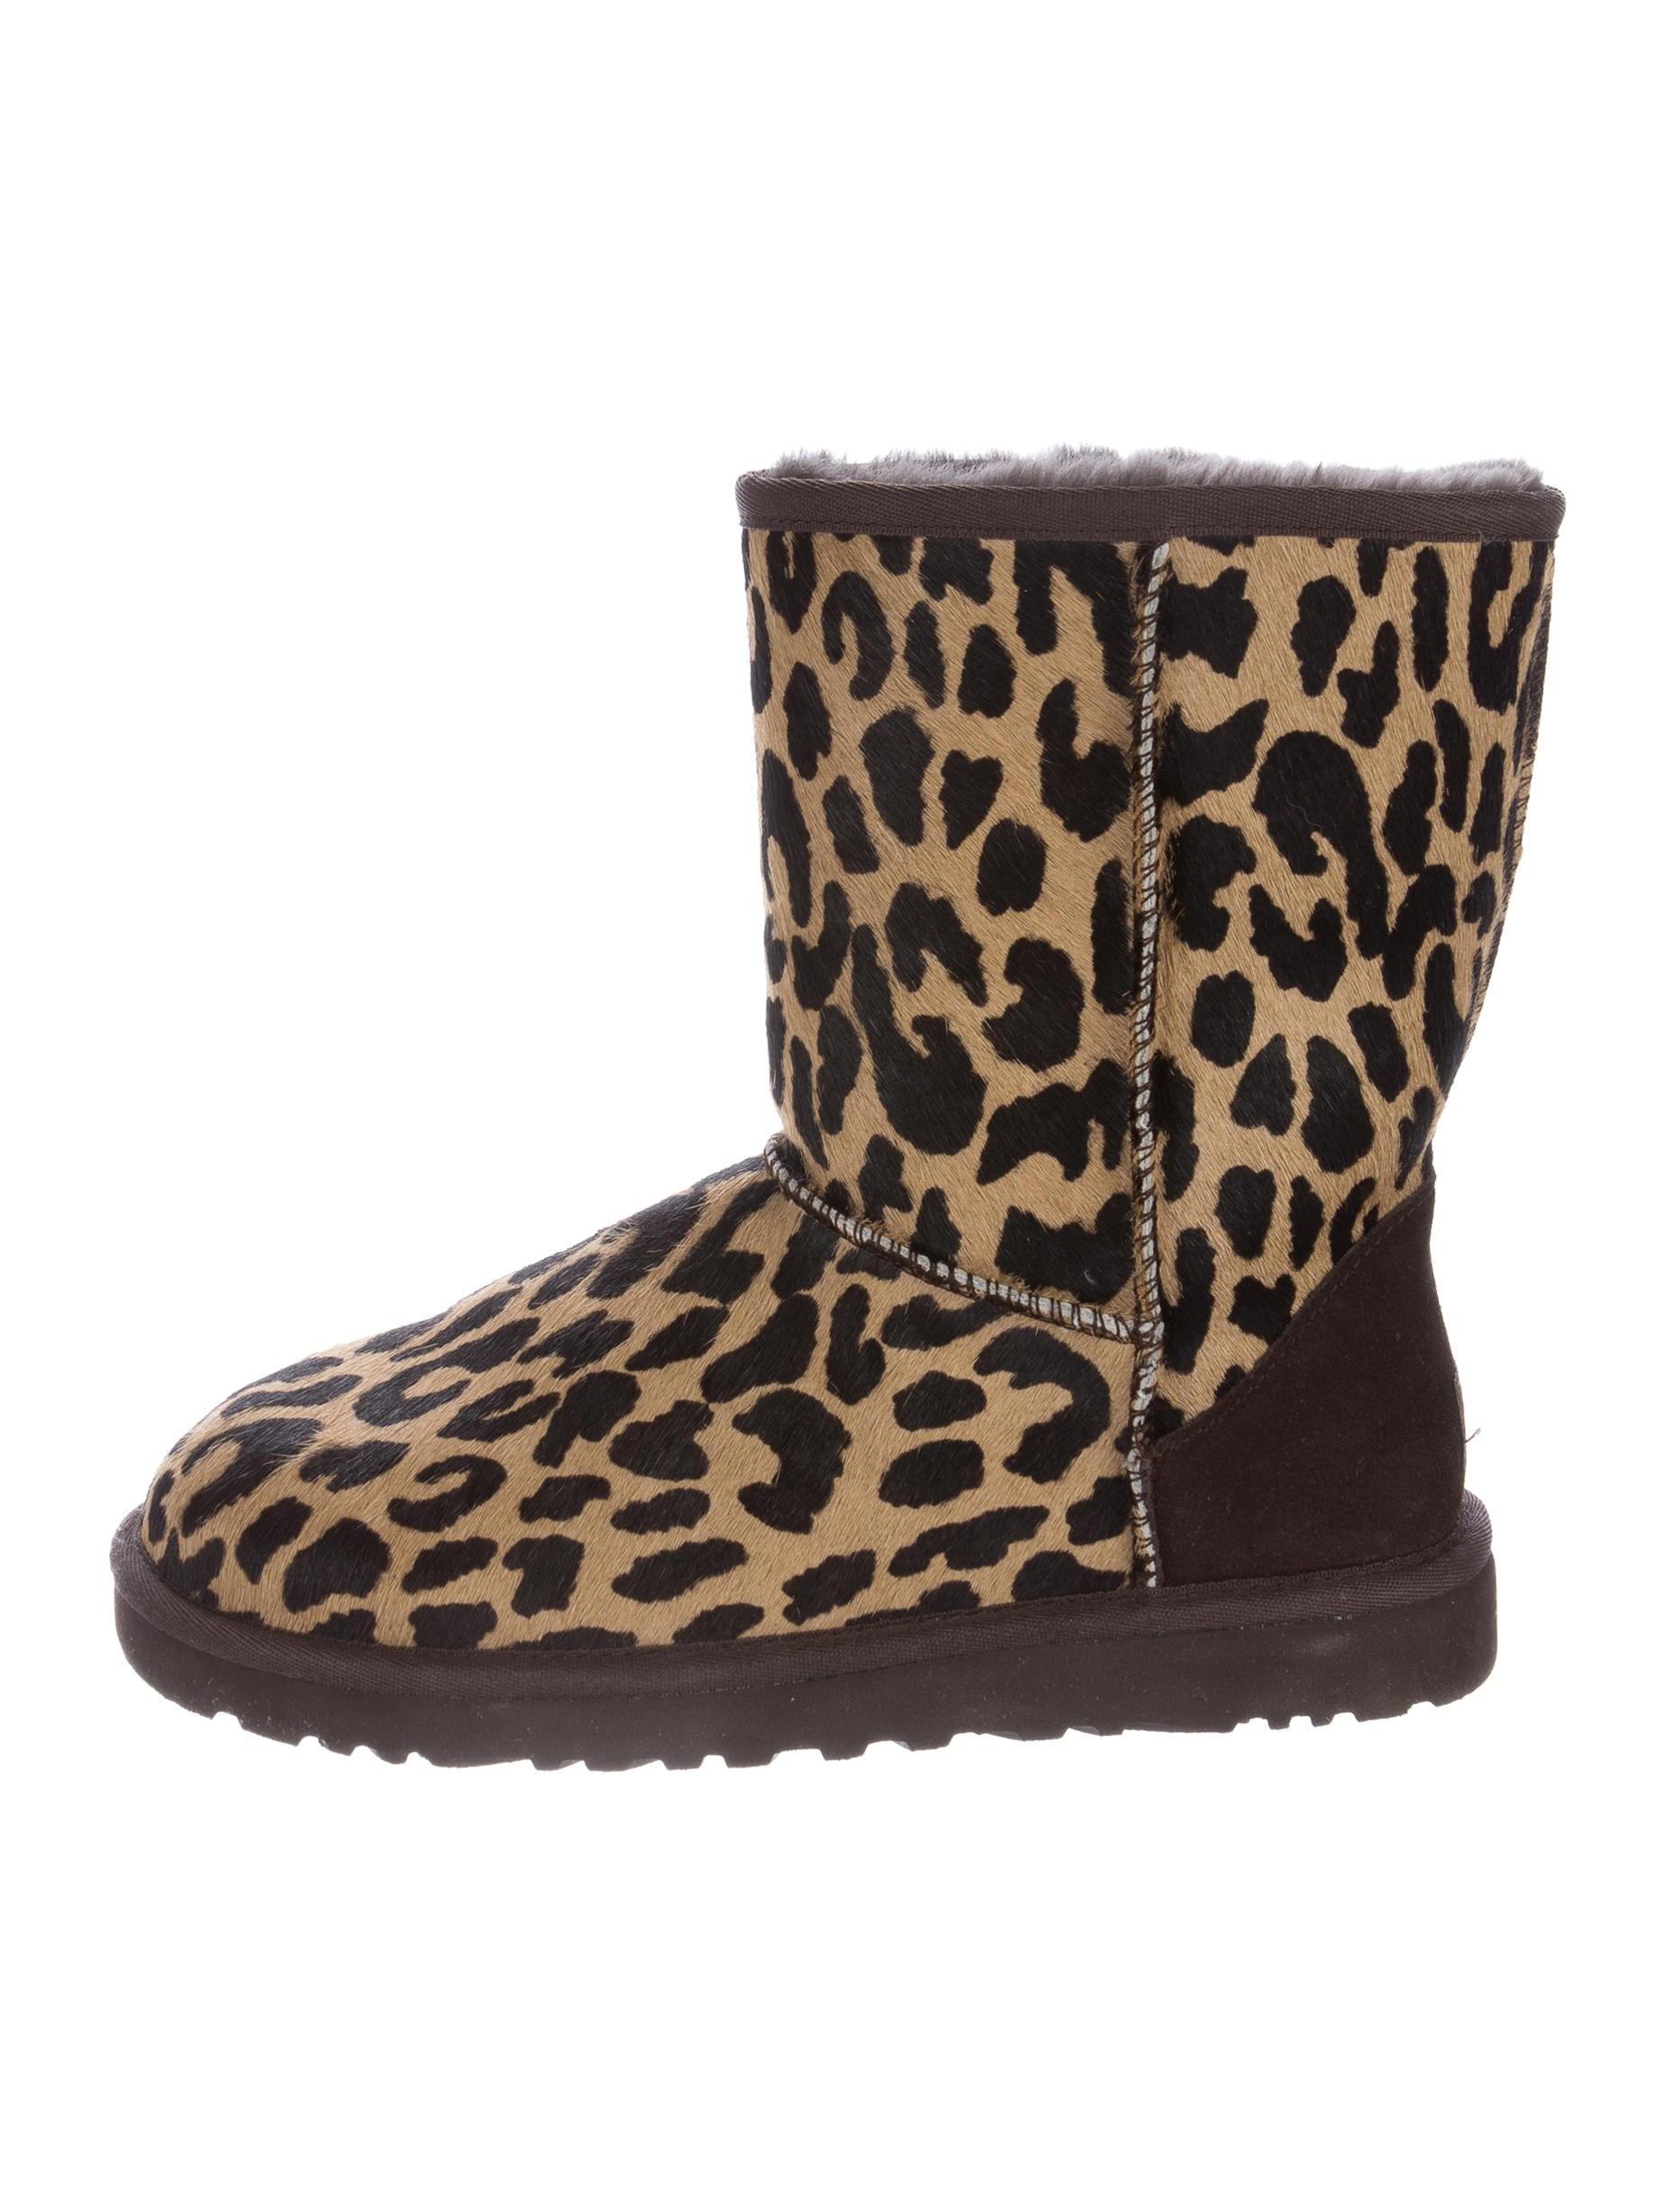 ugg australia leopard ponyhair boots shoes wuugg21304